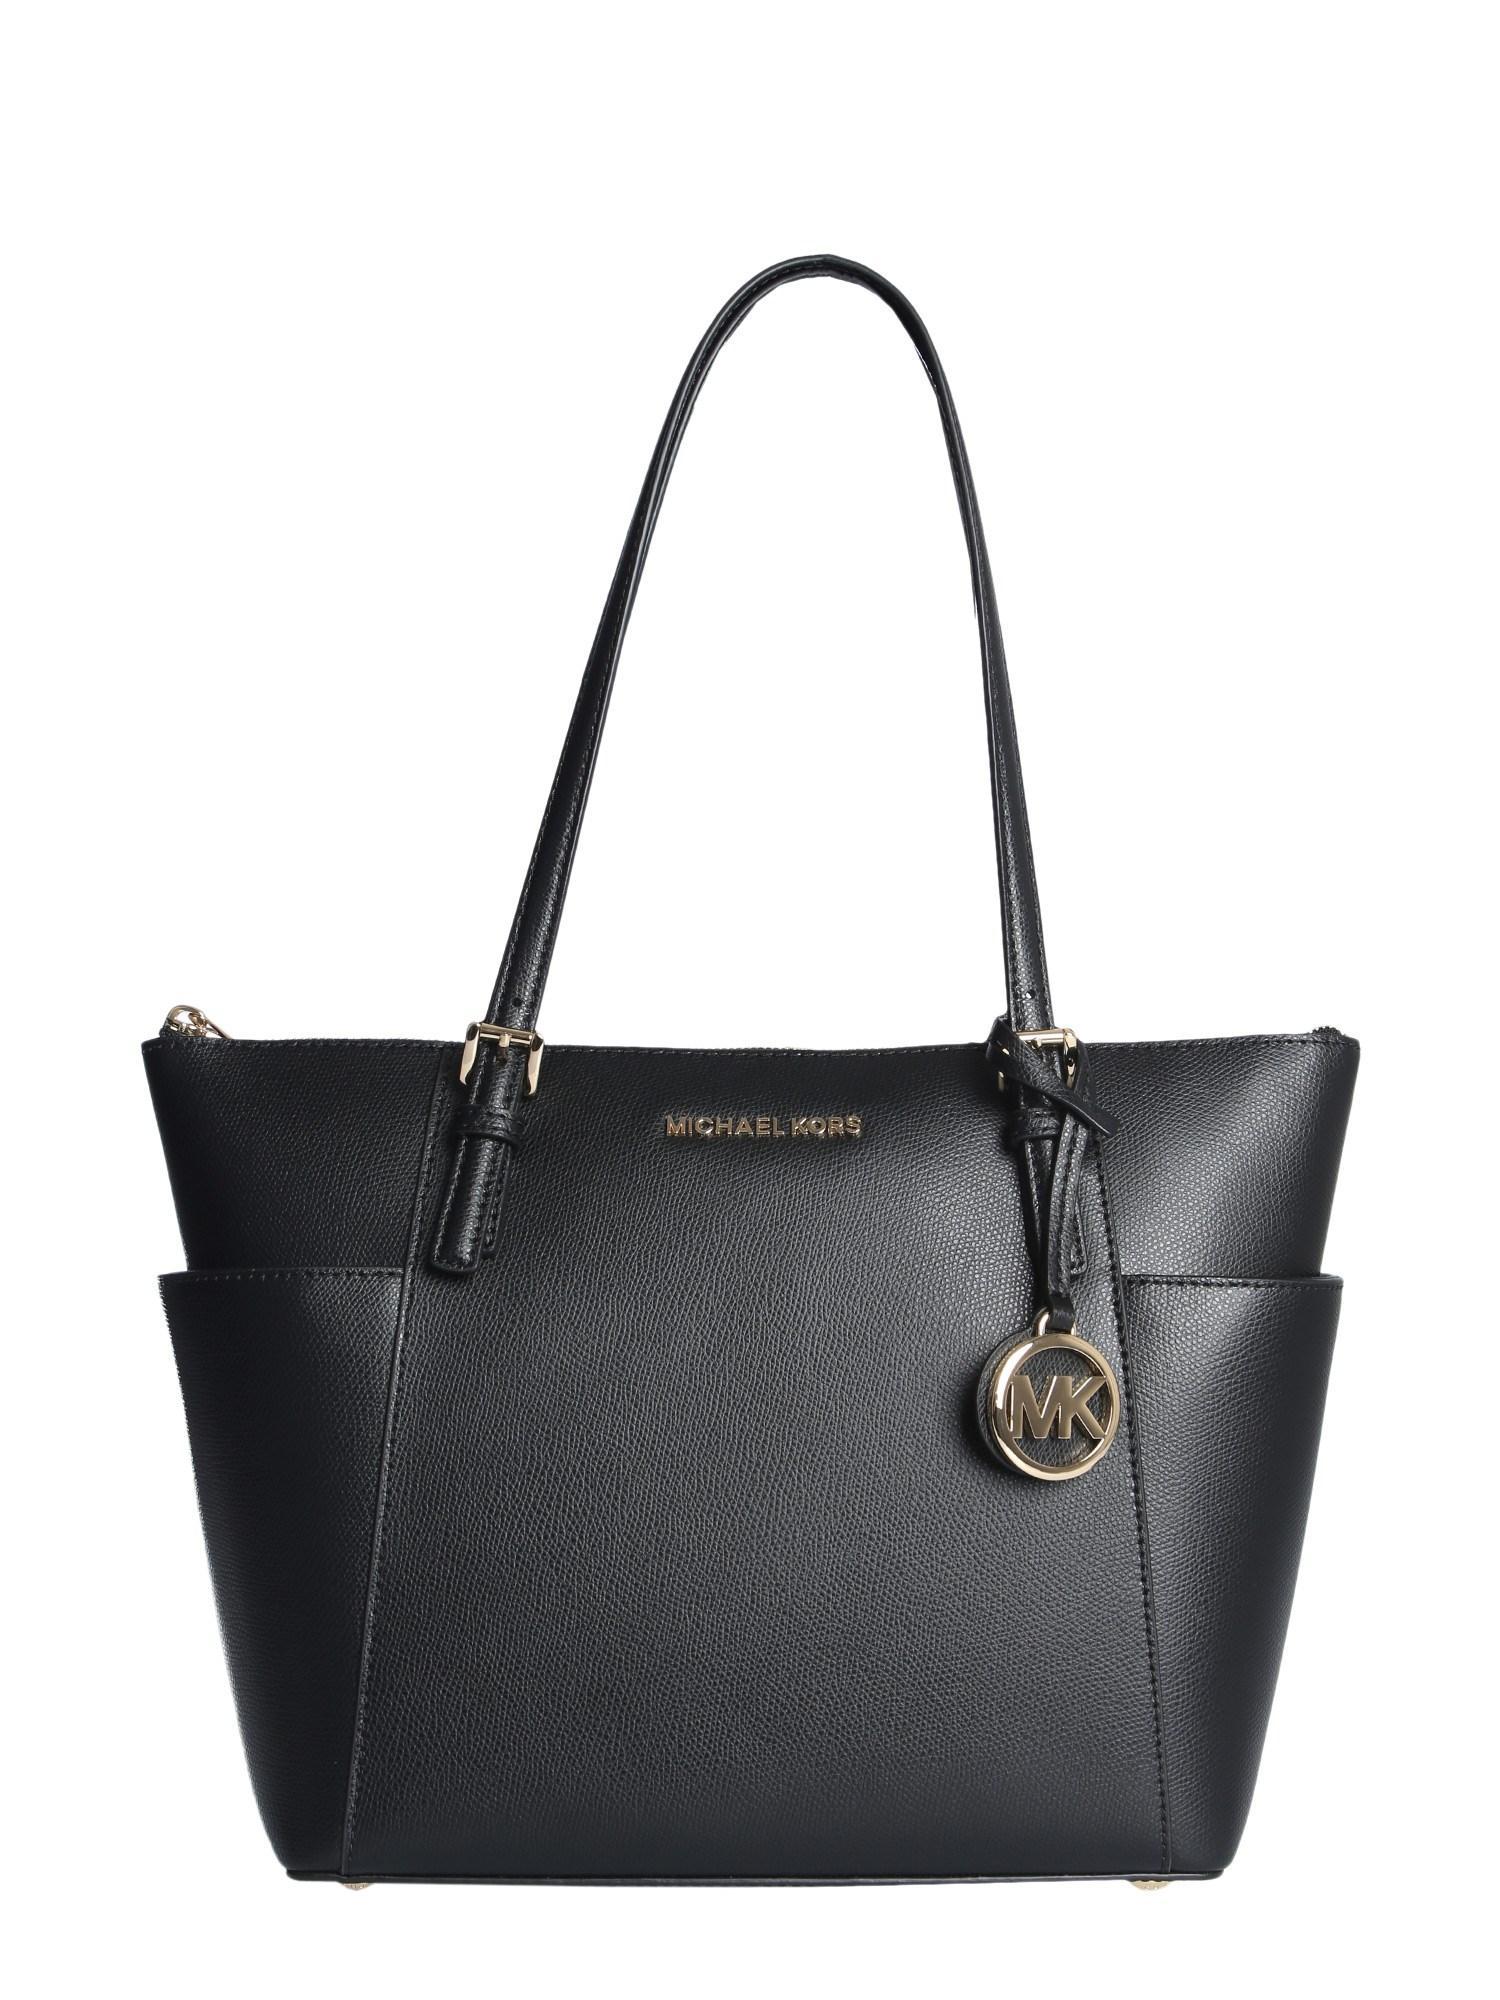 1a28105cba8d MICHAEL Michael Kors. Women s Black Jet Set Item Tote Bag In Saffiano  Leather